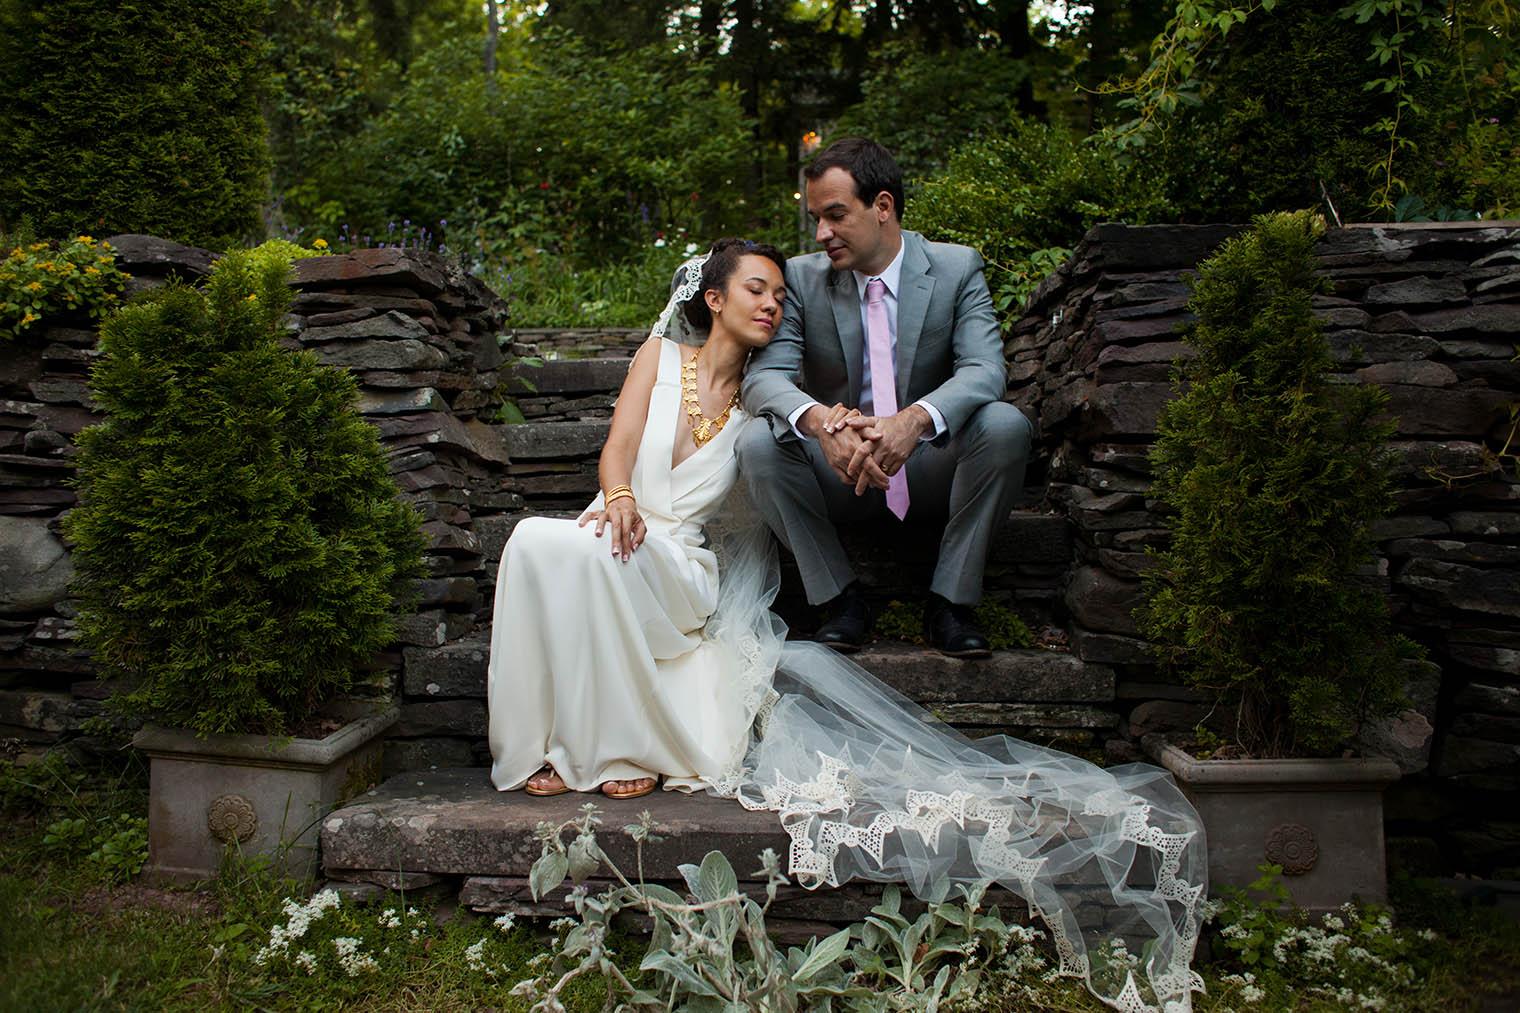 roxbury barn wedding venue in upstate ny